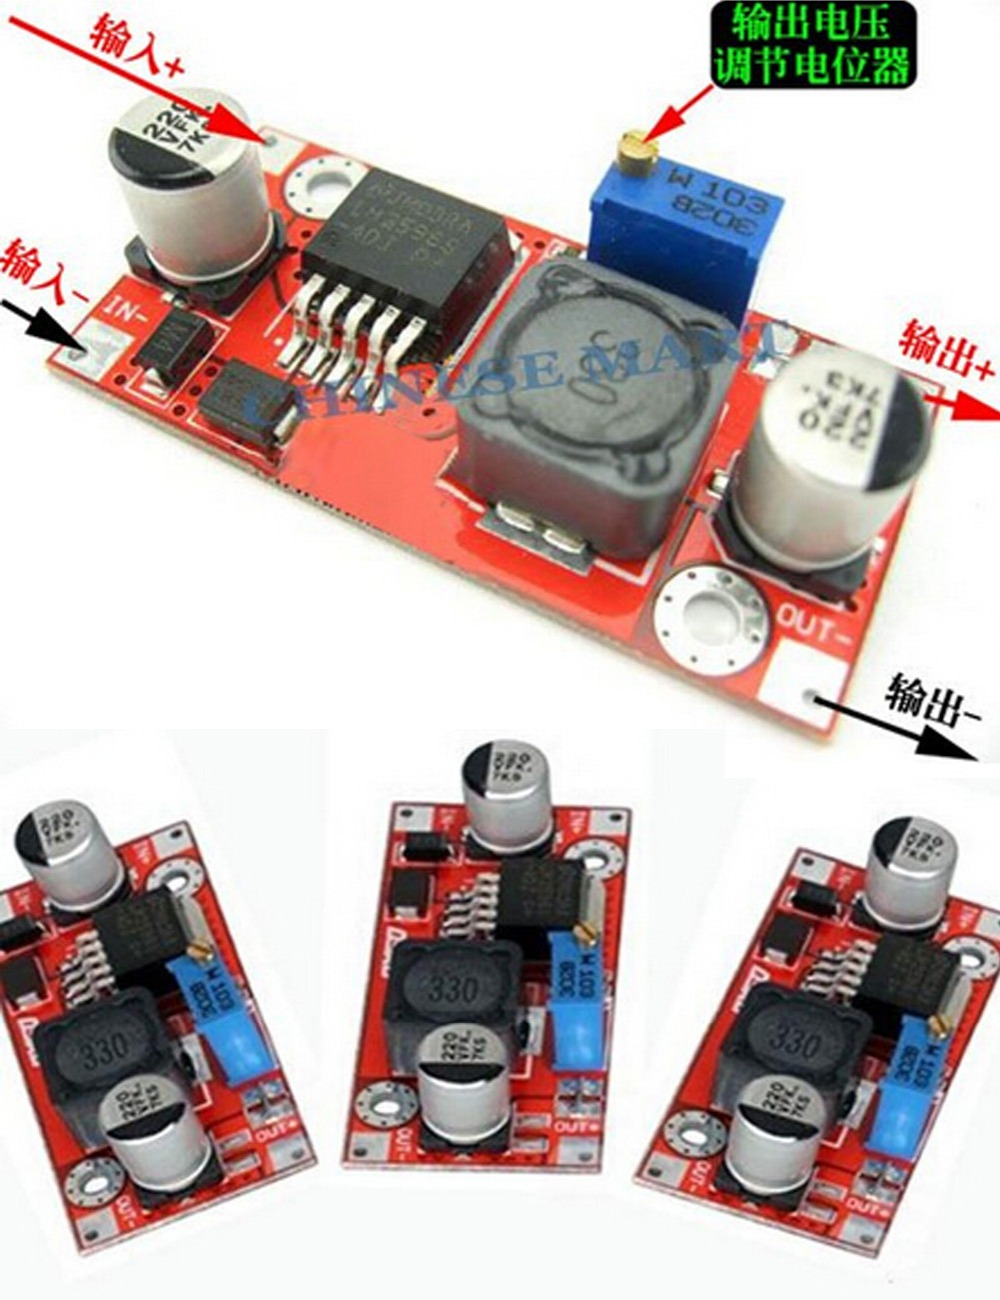 200pcs/lot LM2596 DC-DC Step Down Adjustable Power Supply Module 4-35V LM2596 dc-dc module Wholesale Free shipping #E09056